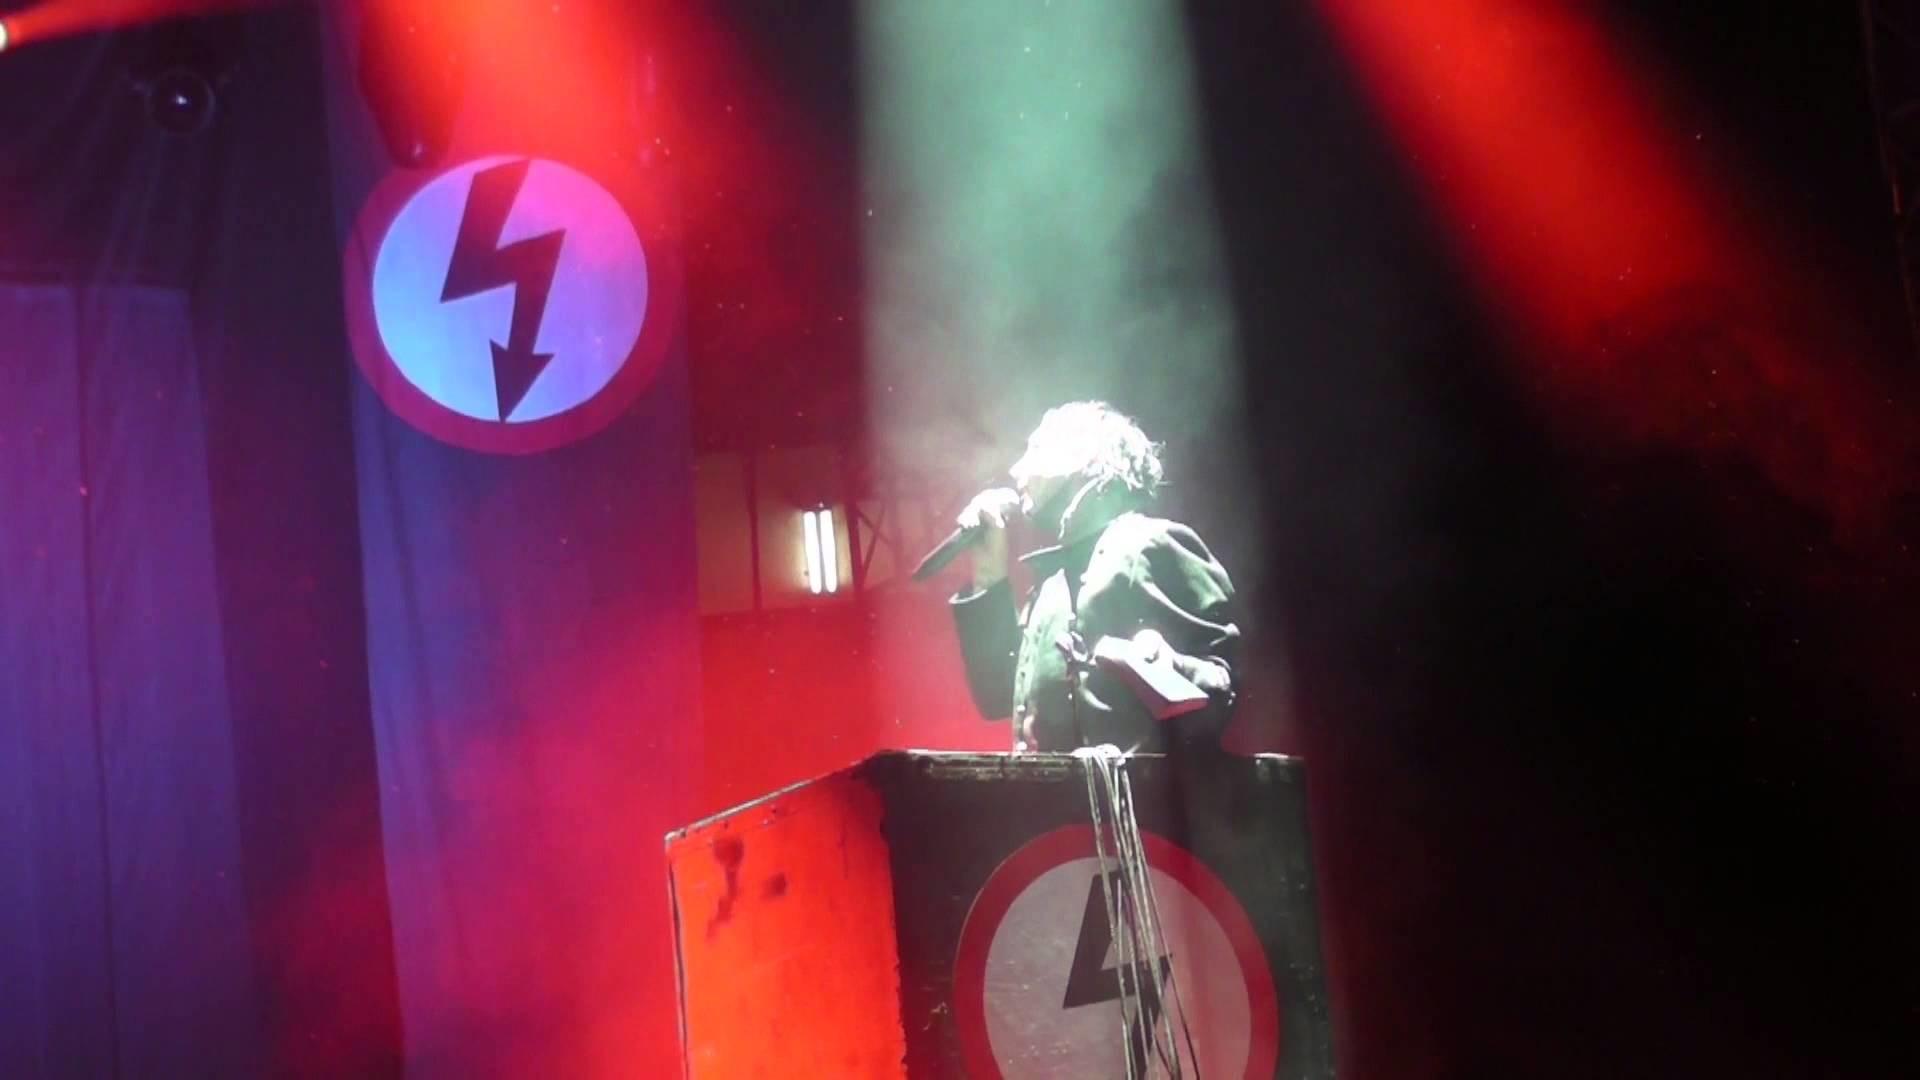 Mas Wallpapers de Marilyn Manson – Taringa!